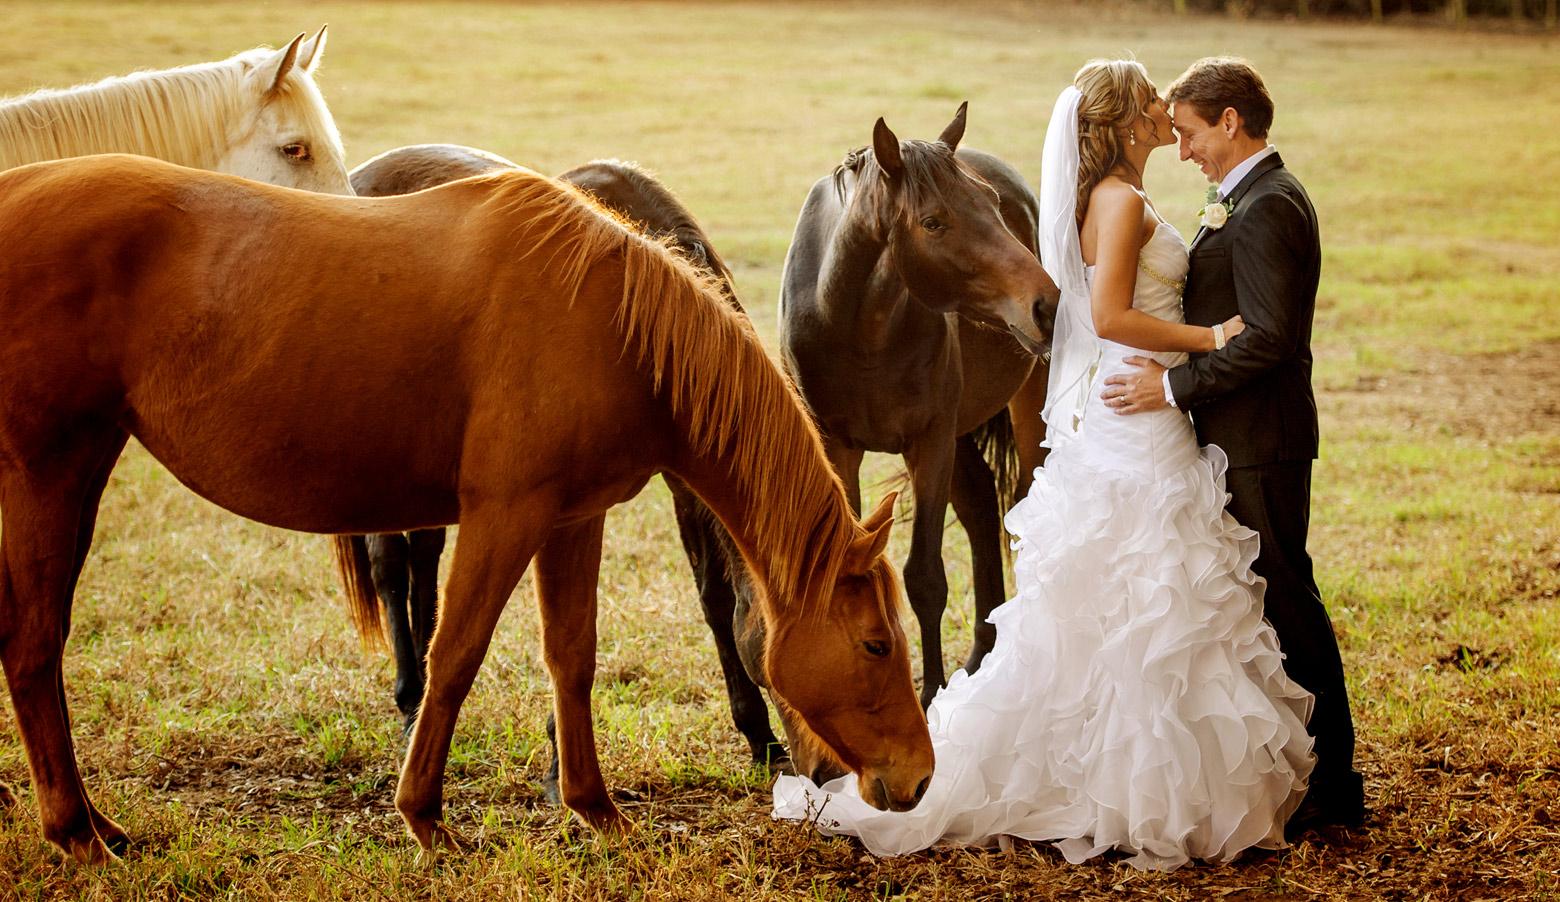 HH-wedding-10.jpg